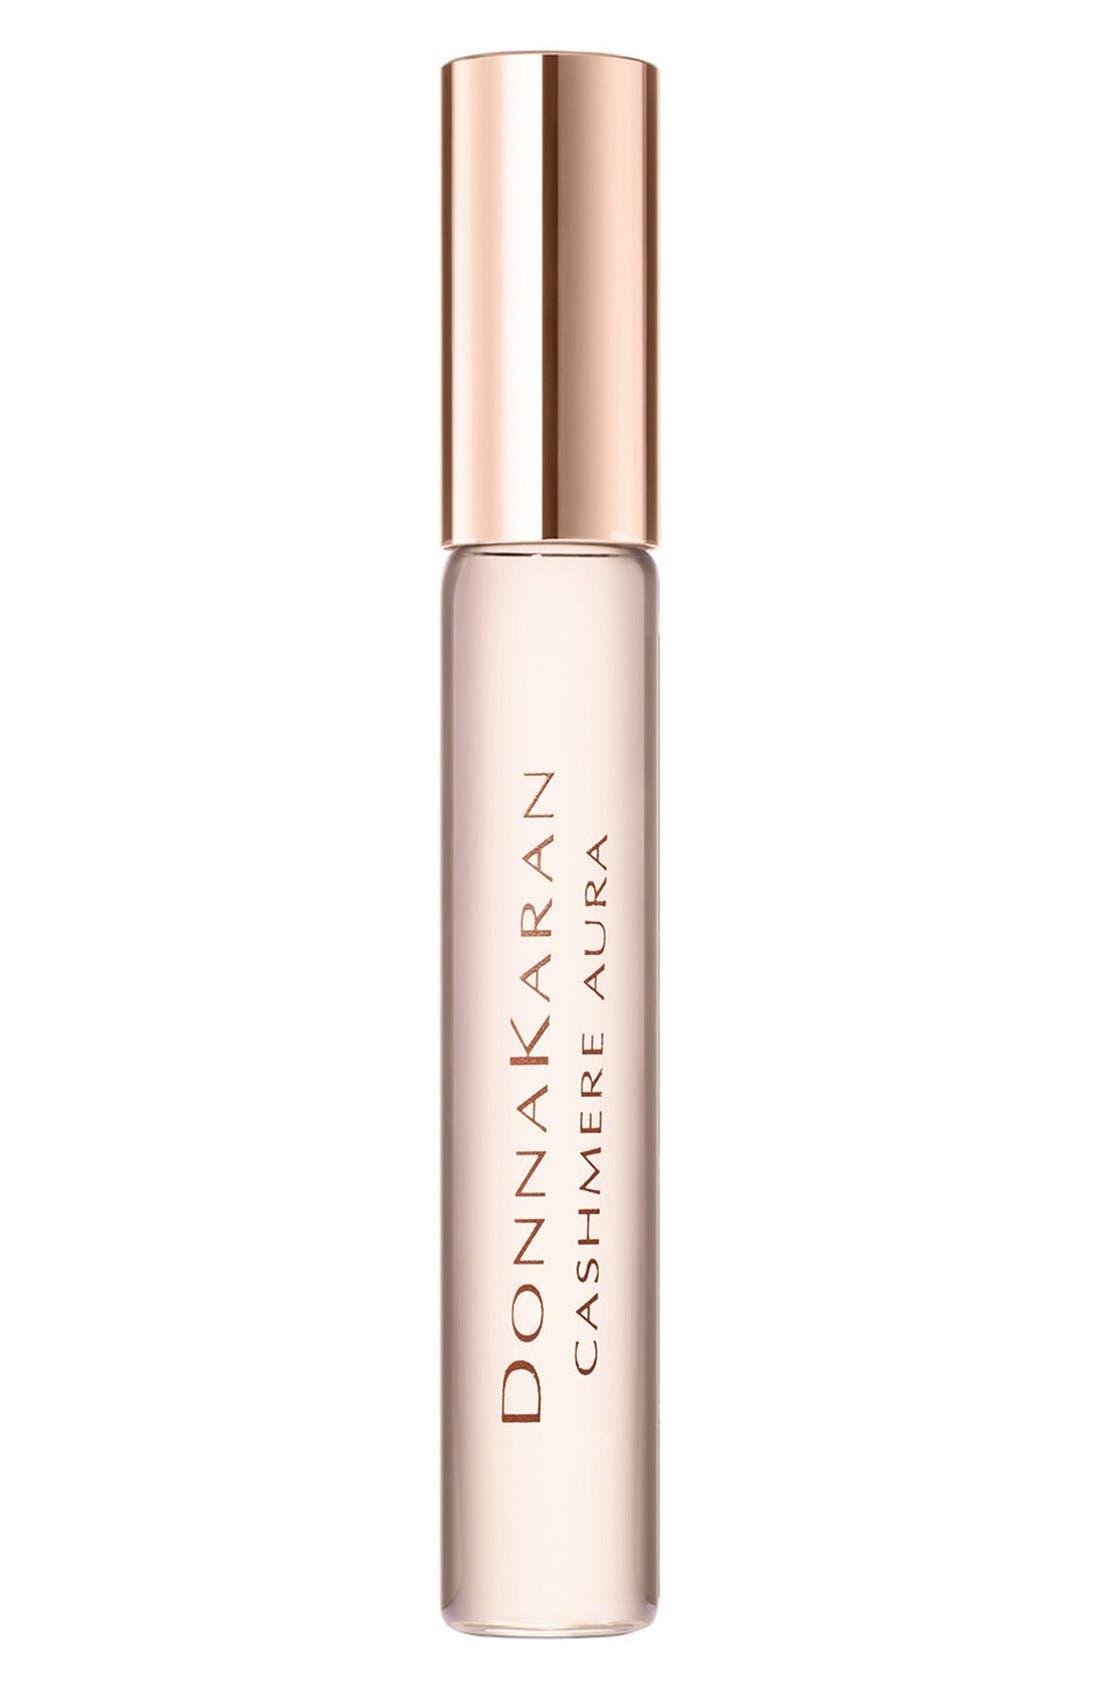 Donna Karan 'Cashmere Aura' Eau de Parfum Rollerball